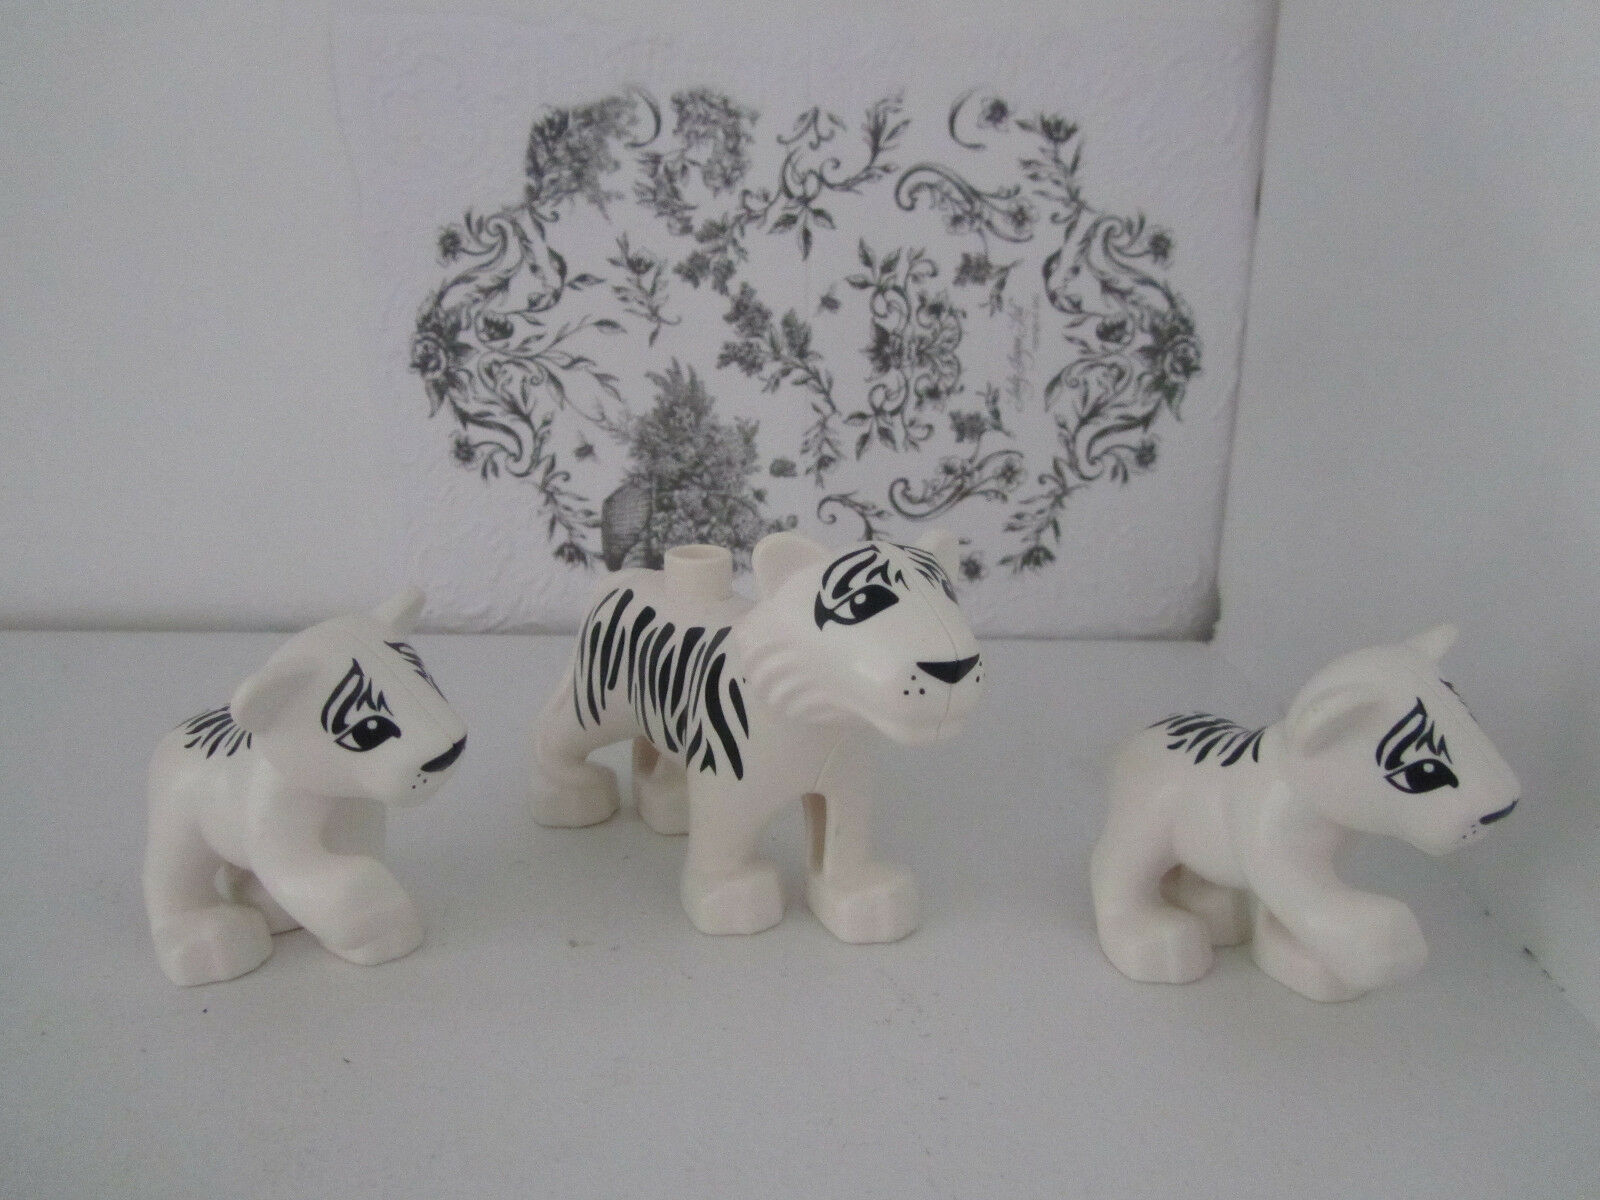 Lego Duplo Animals White Tiger Adult & Babies Zoo Safari Wild Life Lot Set